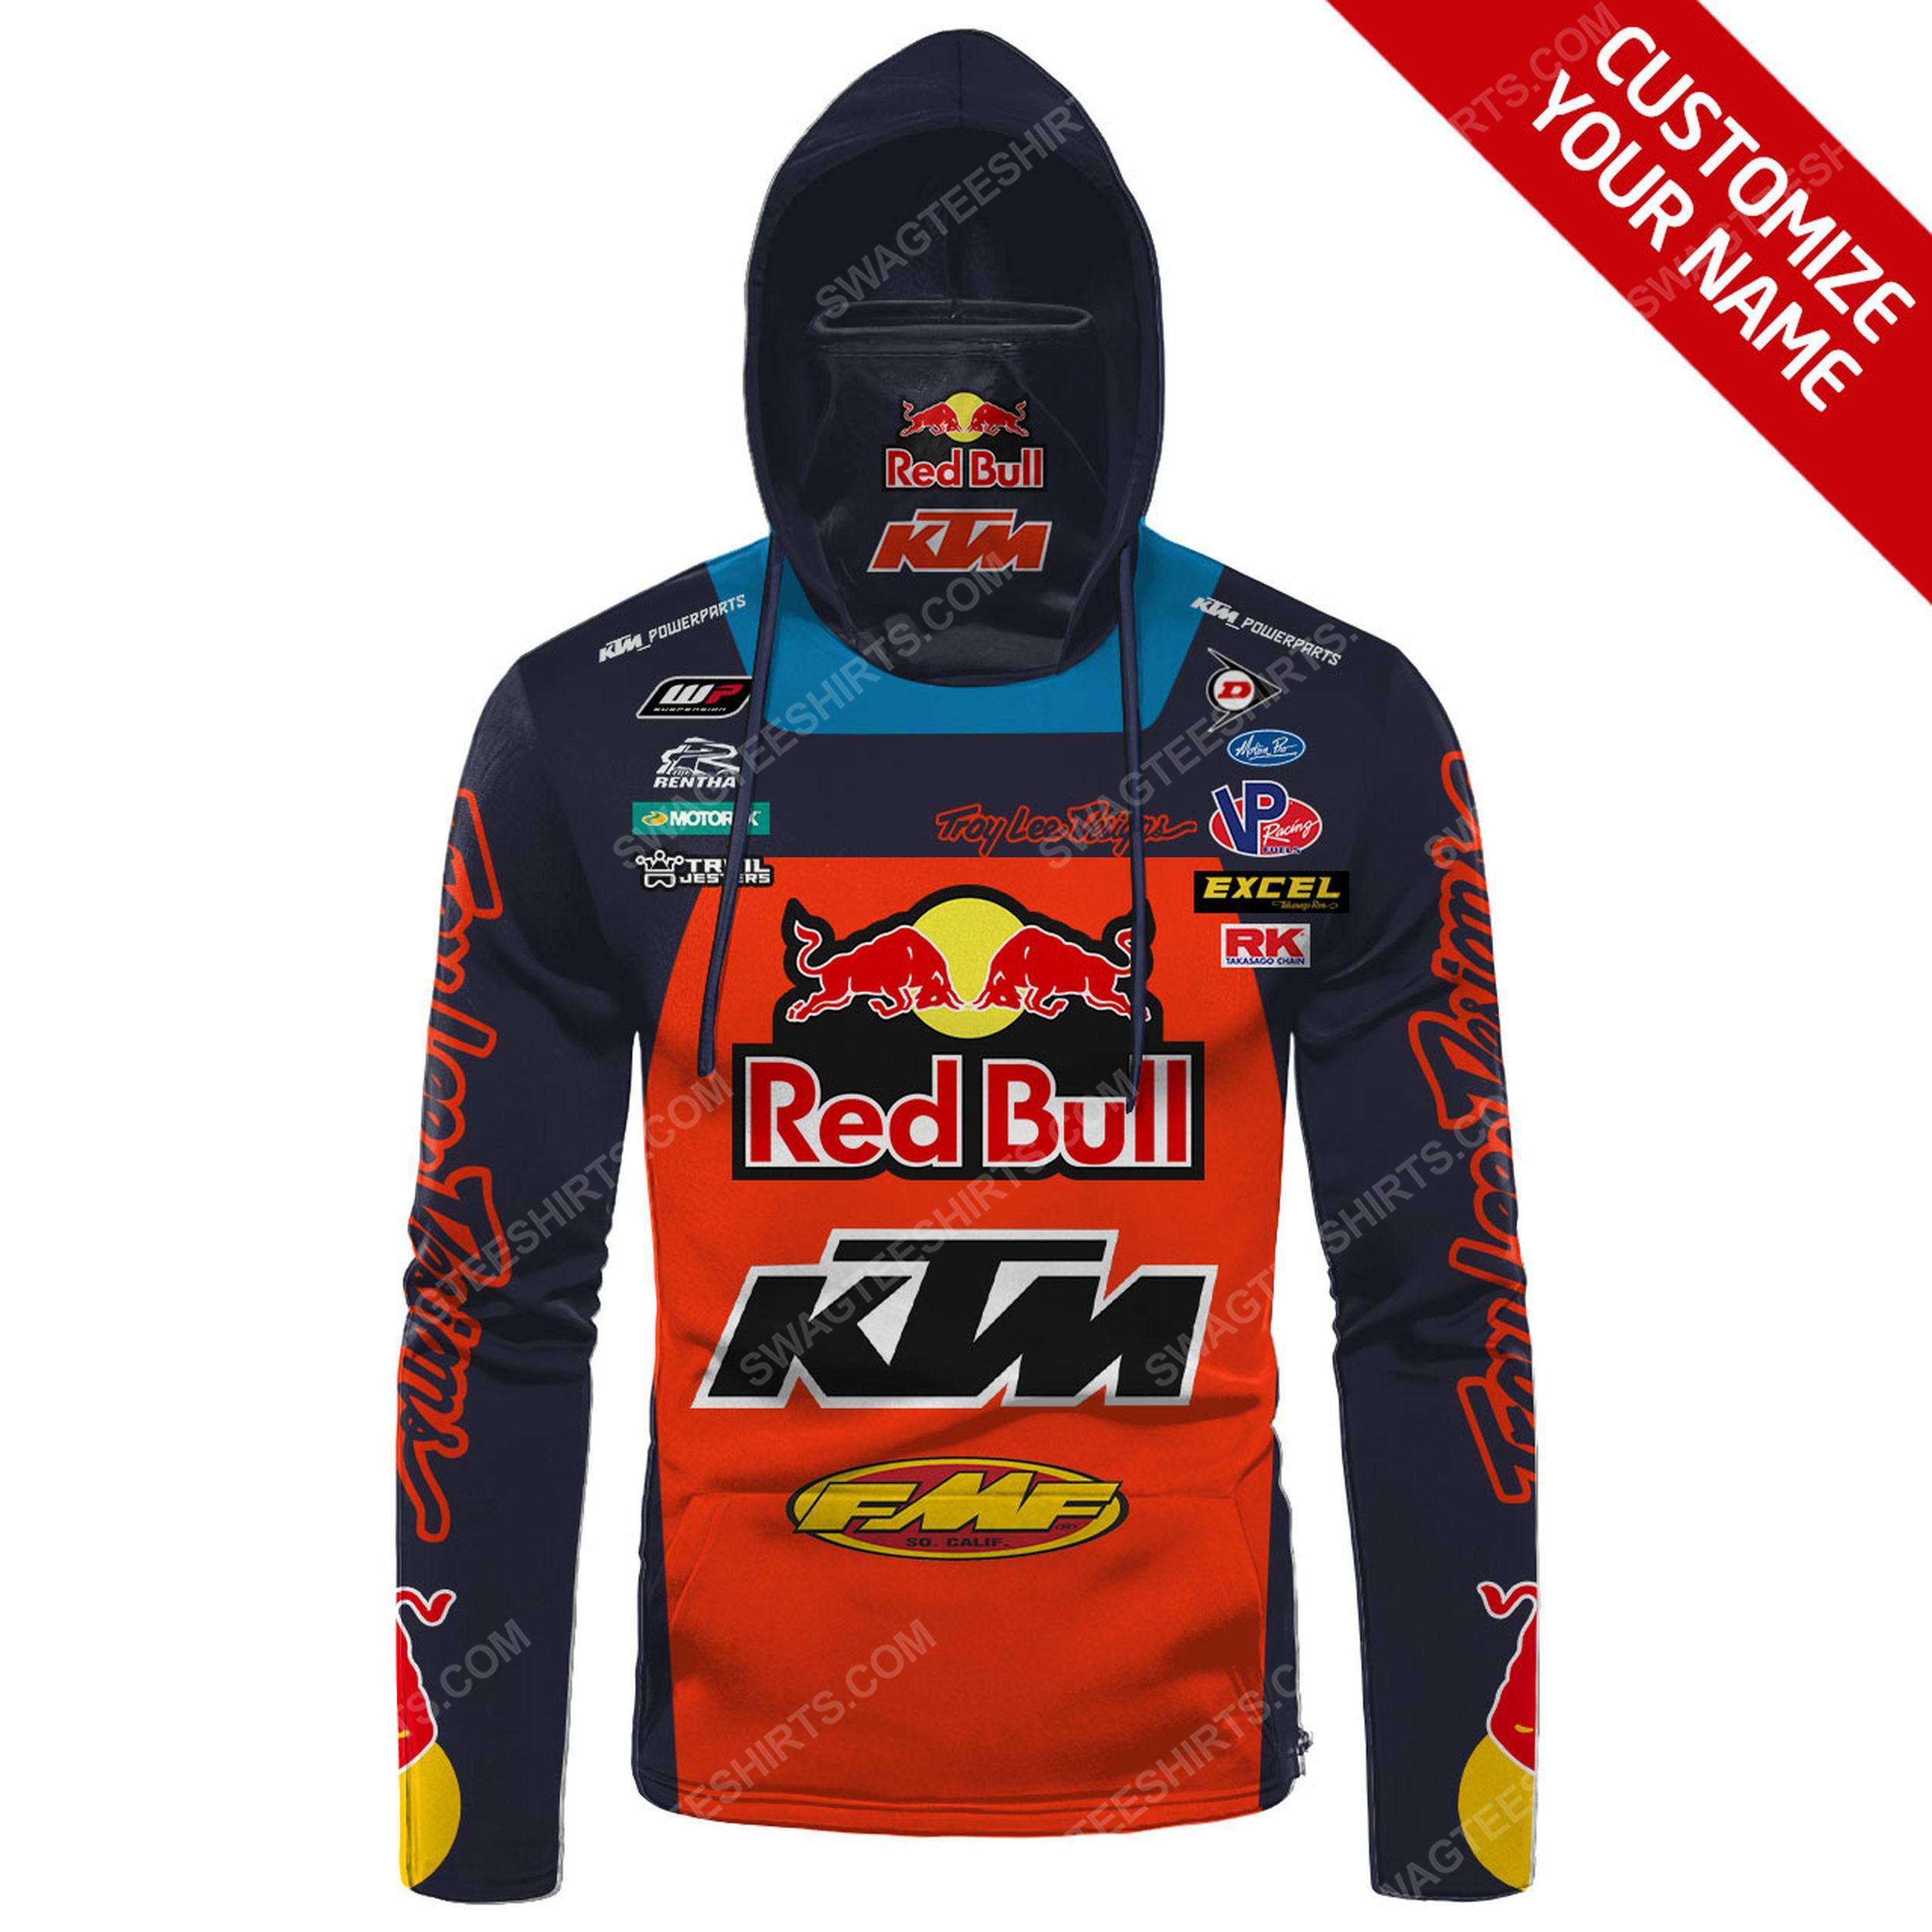 Custom name red bull ktm factory racing full print mask hoodie 2(1)